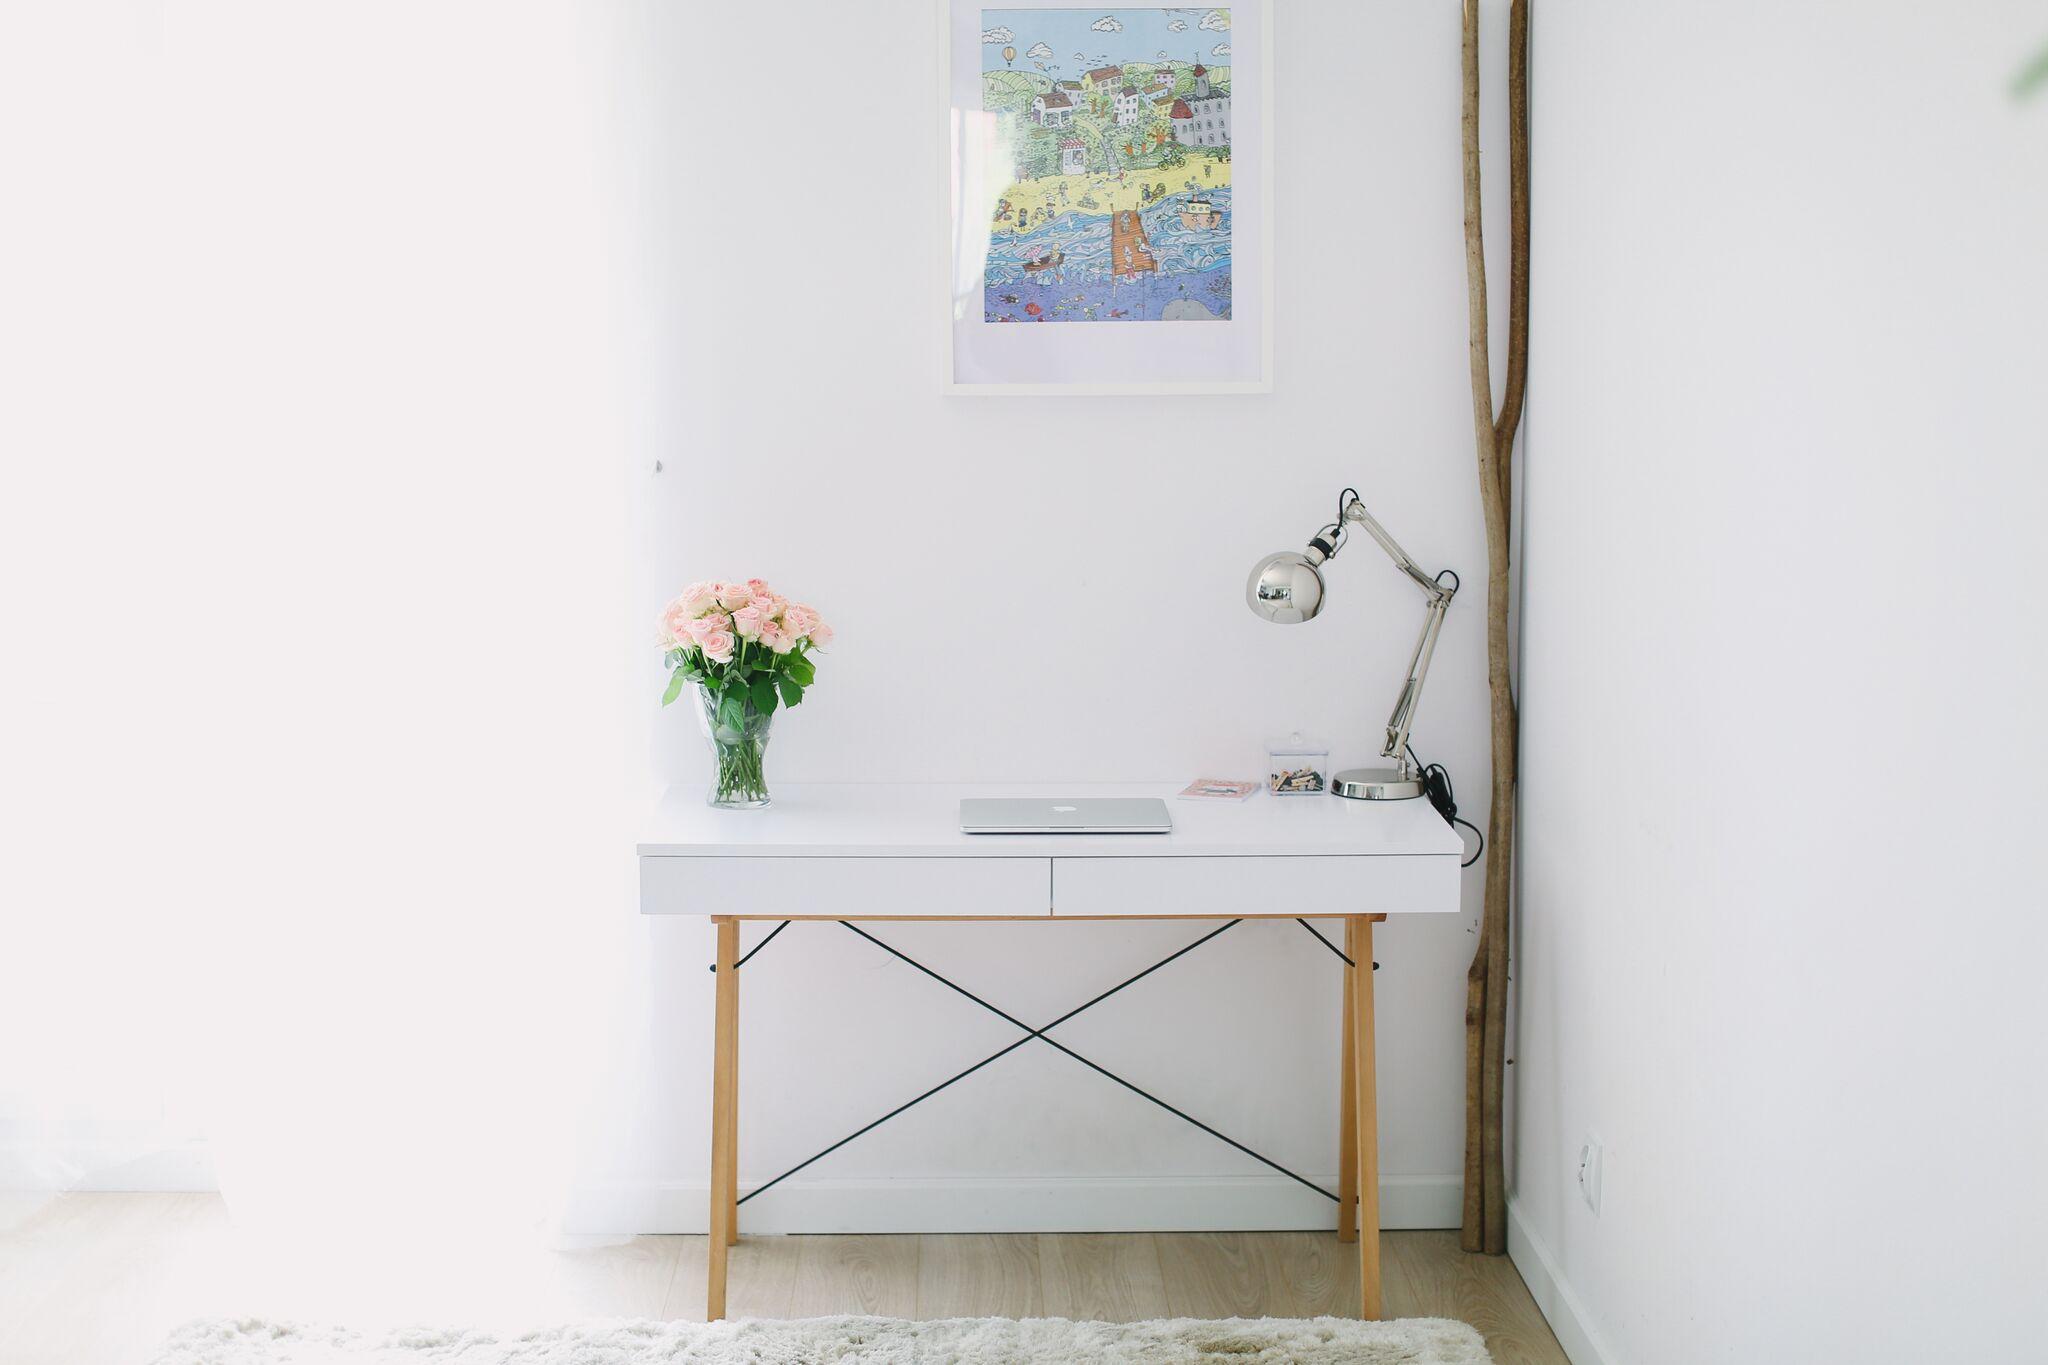 minko biurko basic white ideal design meble designerskie